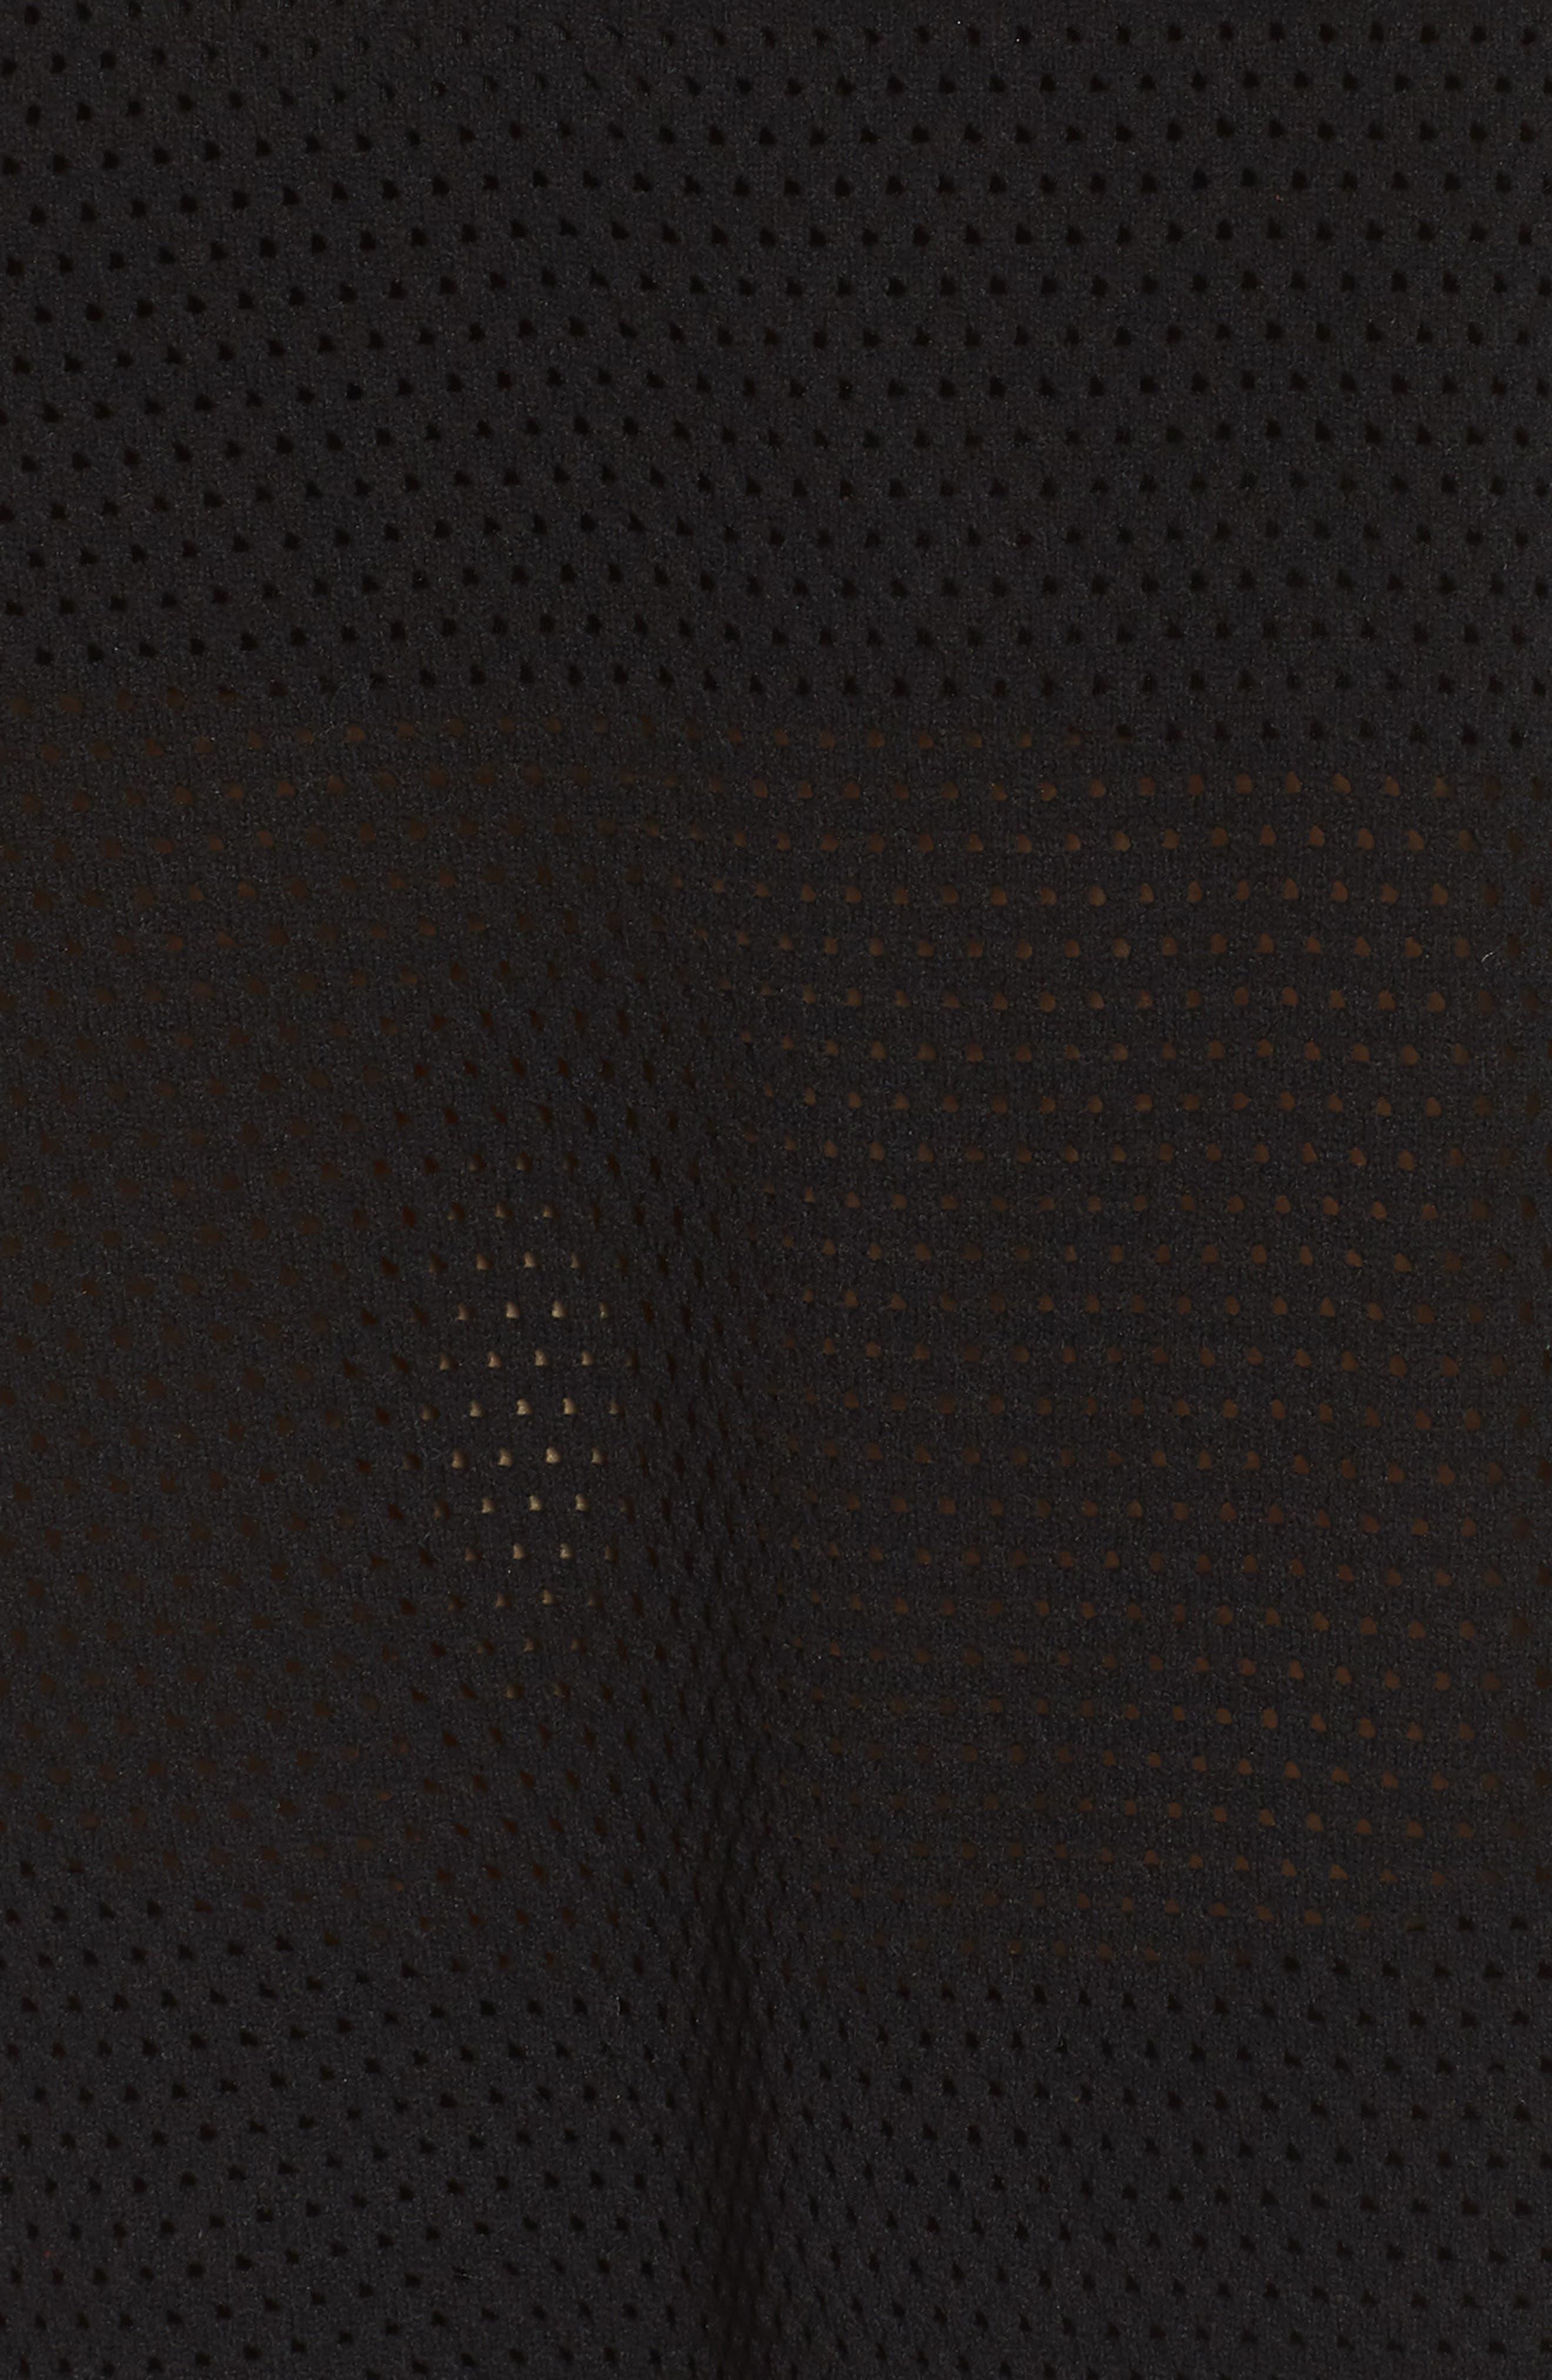 Originals AA-42 Knit Tee,                             Alternate thumbnail 6, color,                             Black / Flash Red